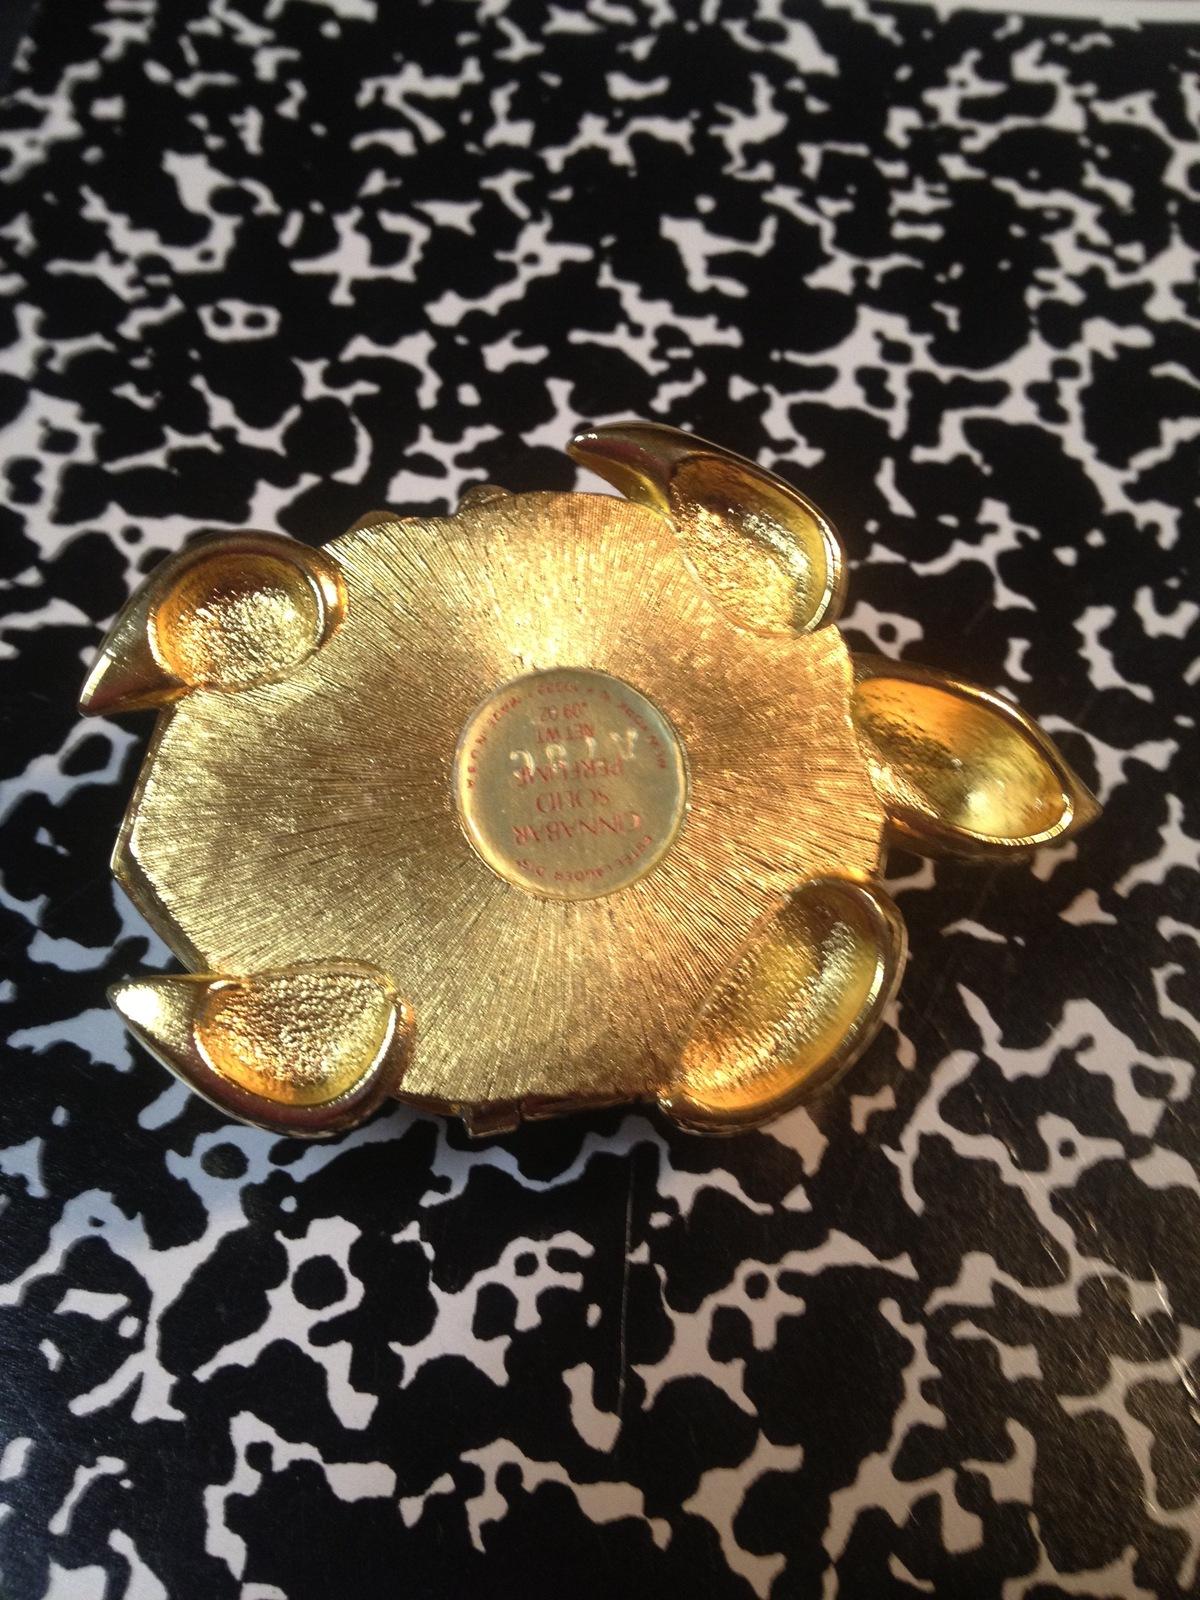 Estee Lauder TURTLE Vintage Solid Perfume Compact - CINNABAR - 1988